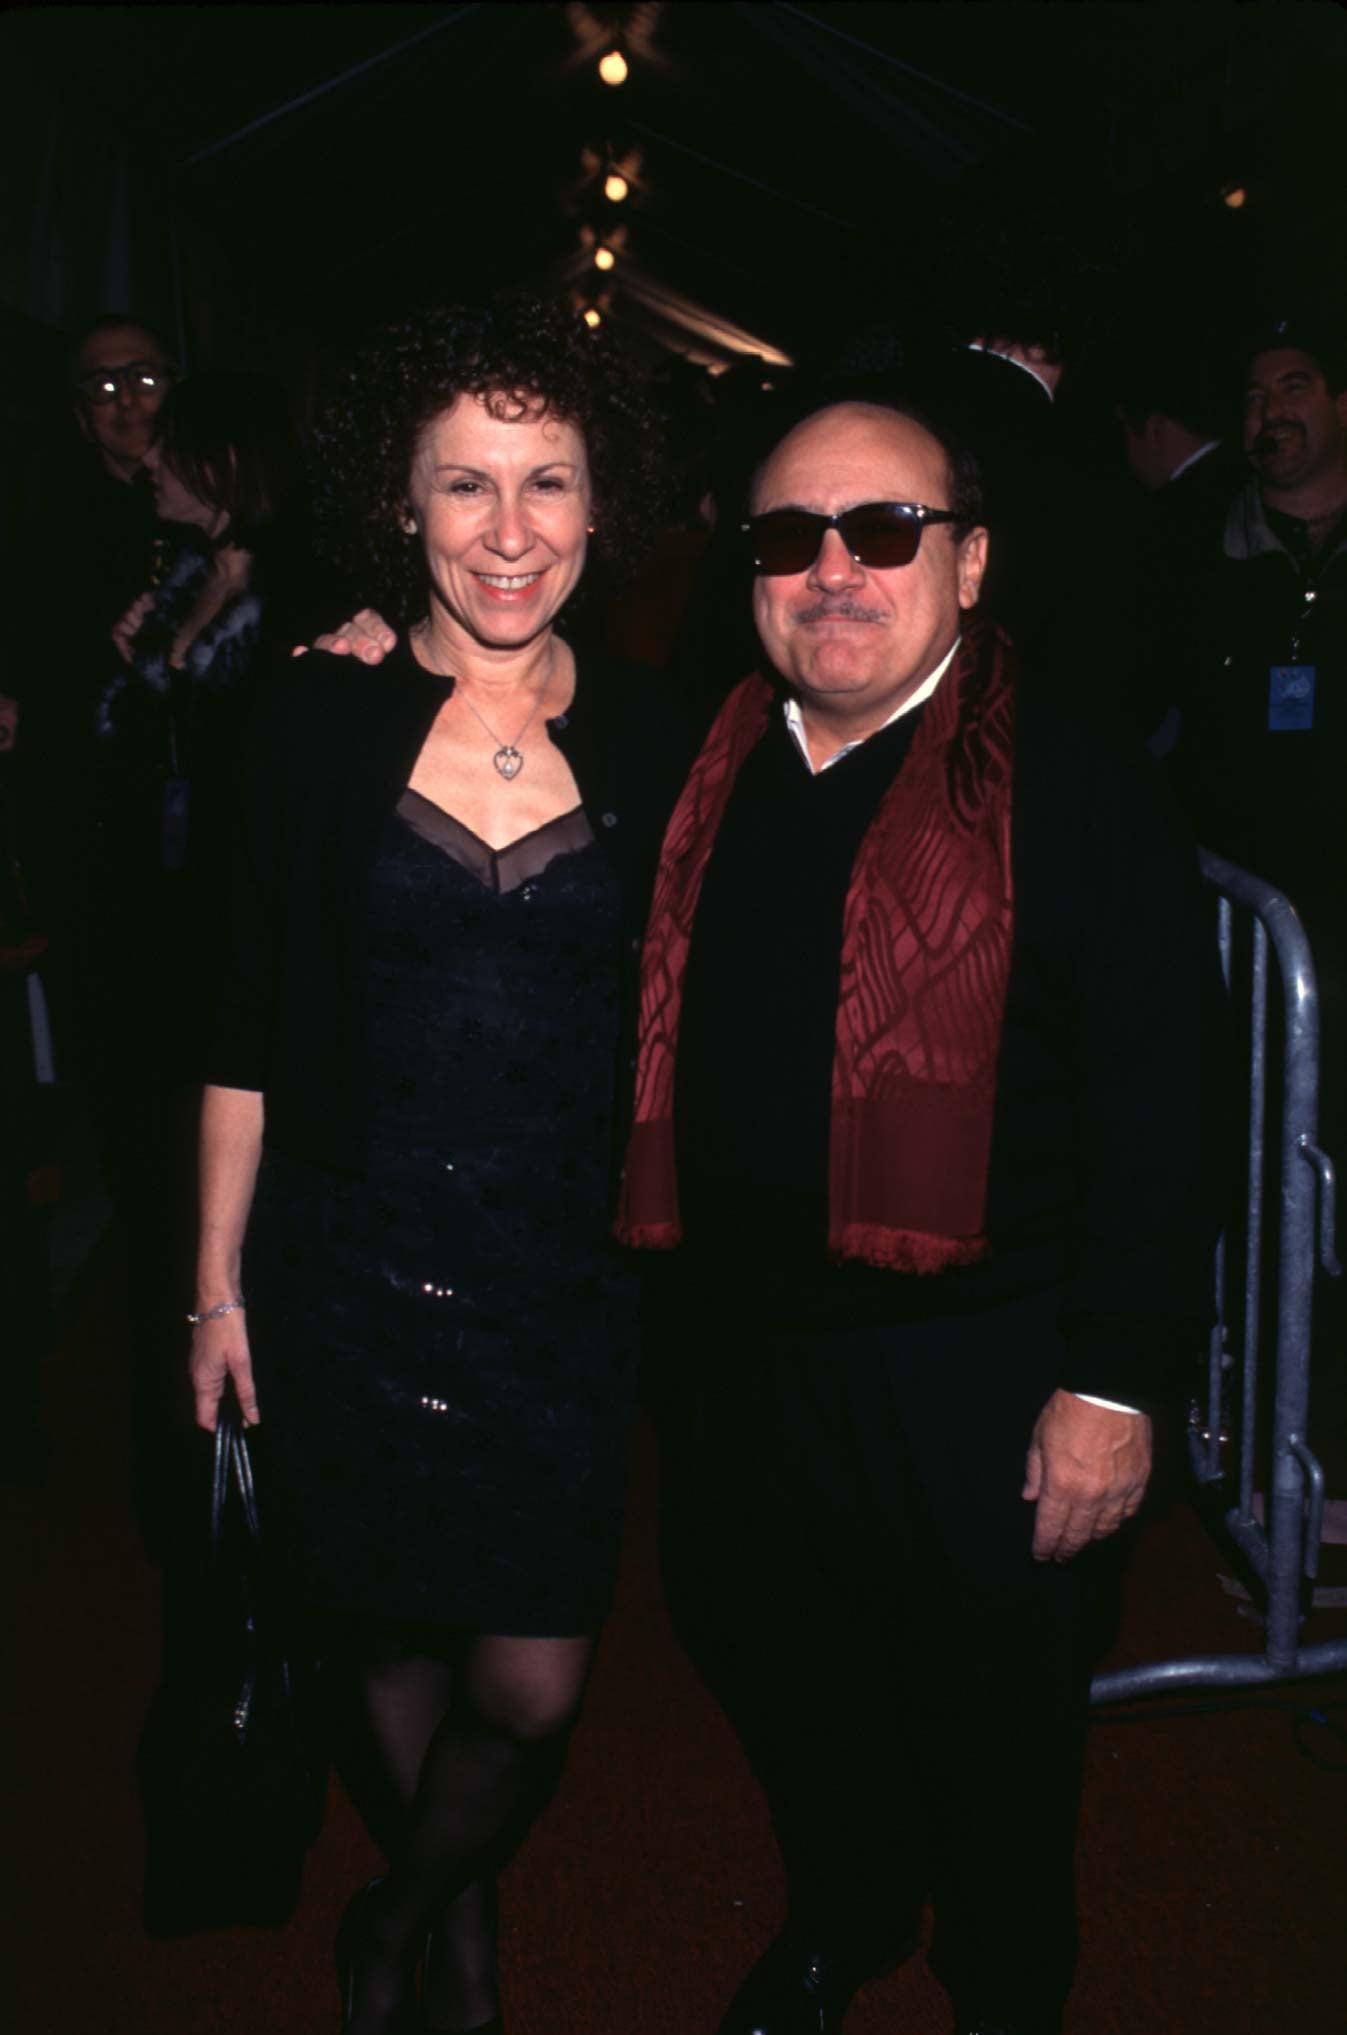 Danny DeVito and Rhea Perlman, 1998 | A Look Back at Love ...